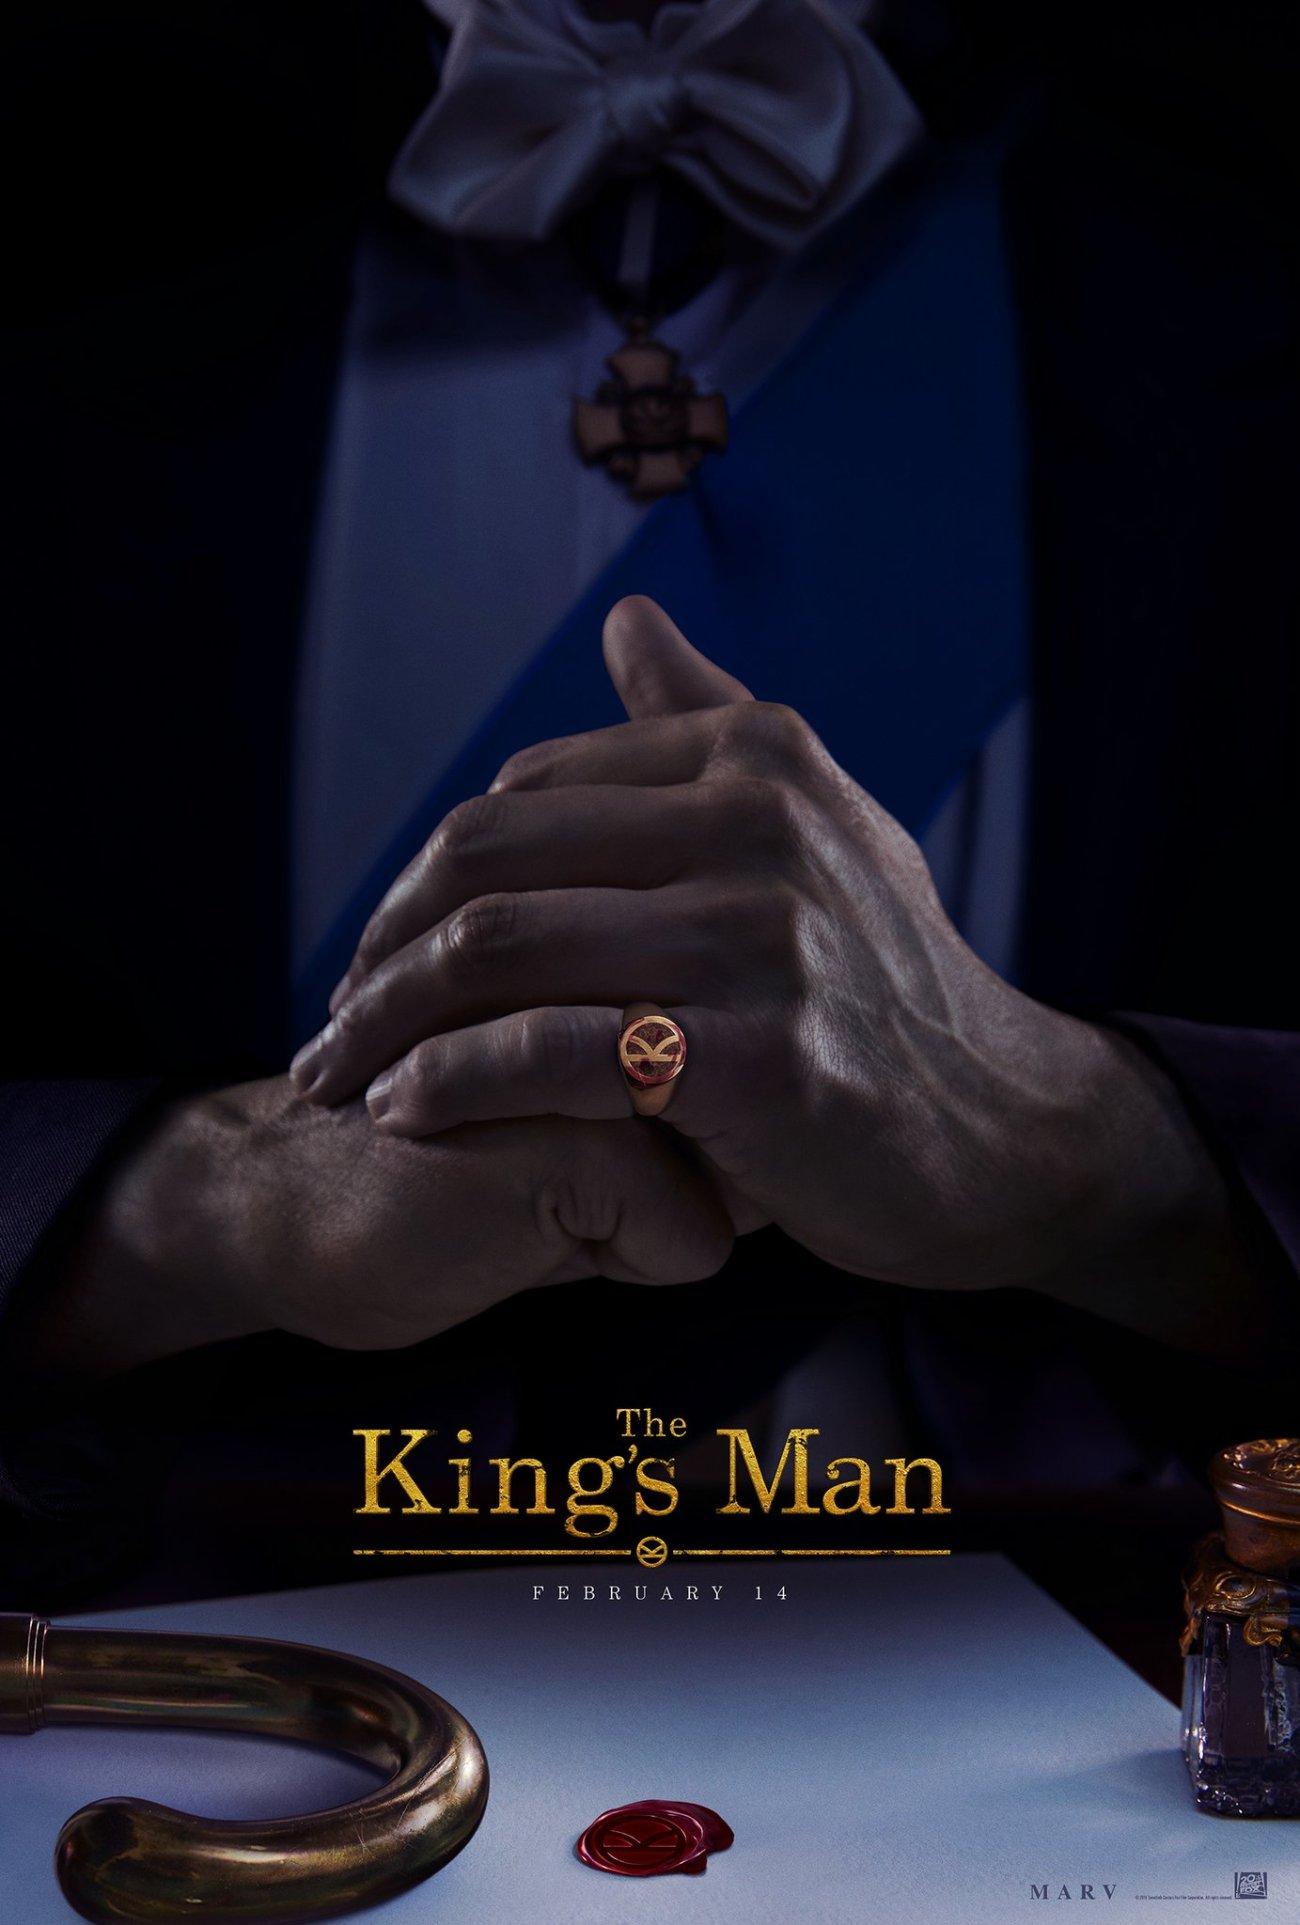 Póster de The King's Man (2020). Imagen: The King's Man Twitter (@KingsmanMovie).